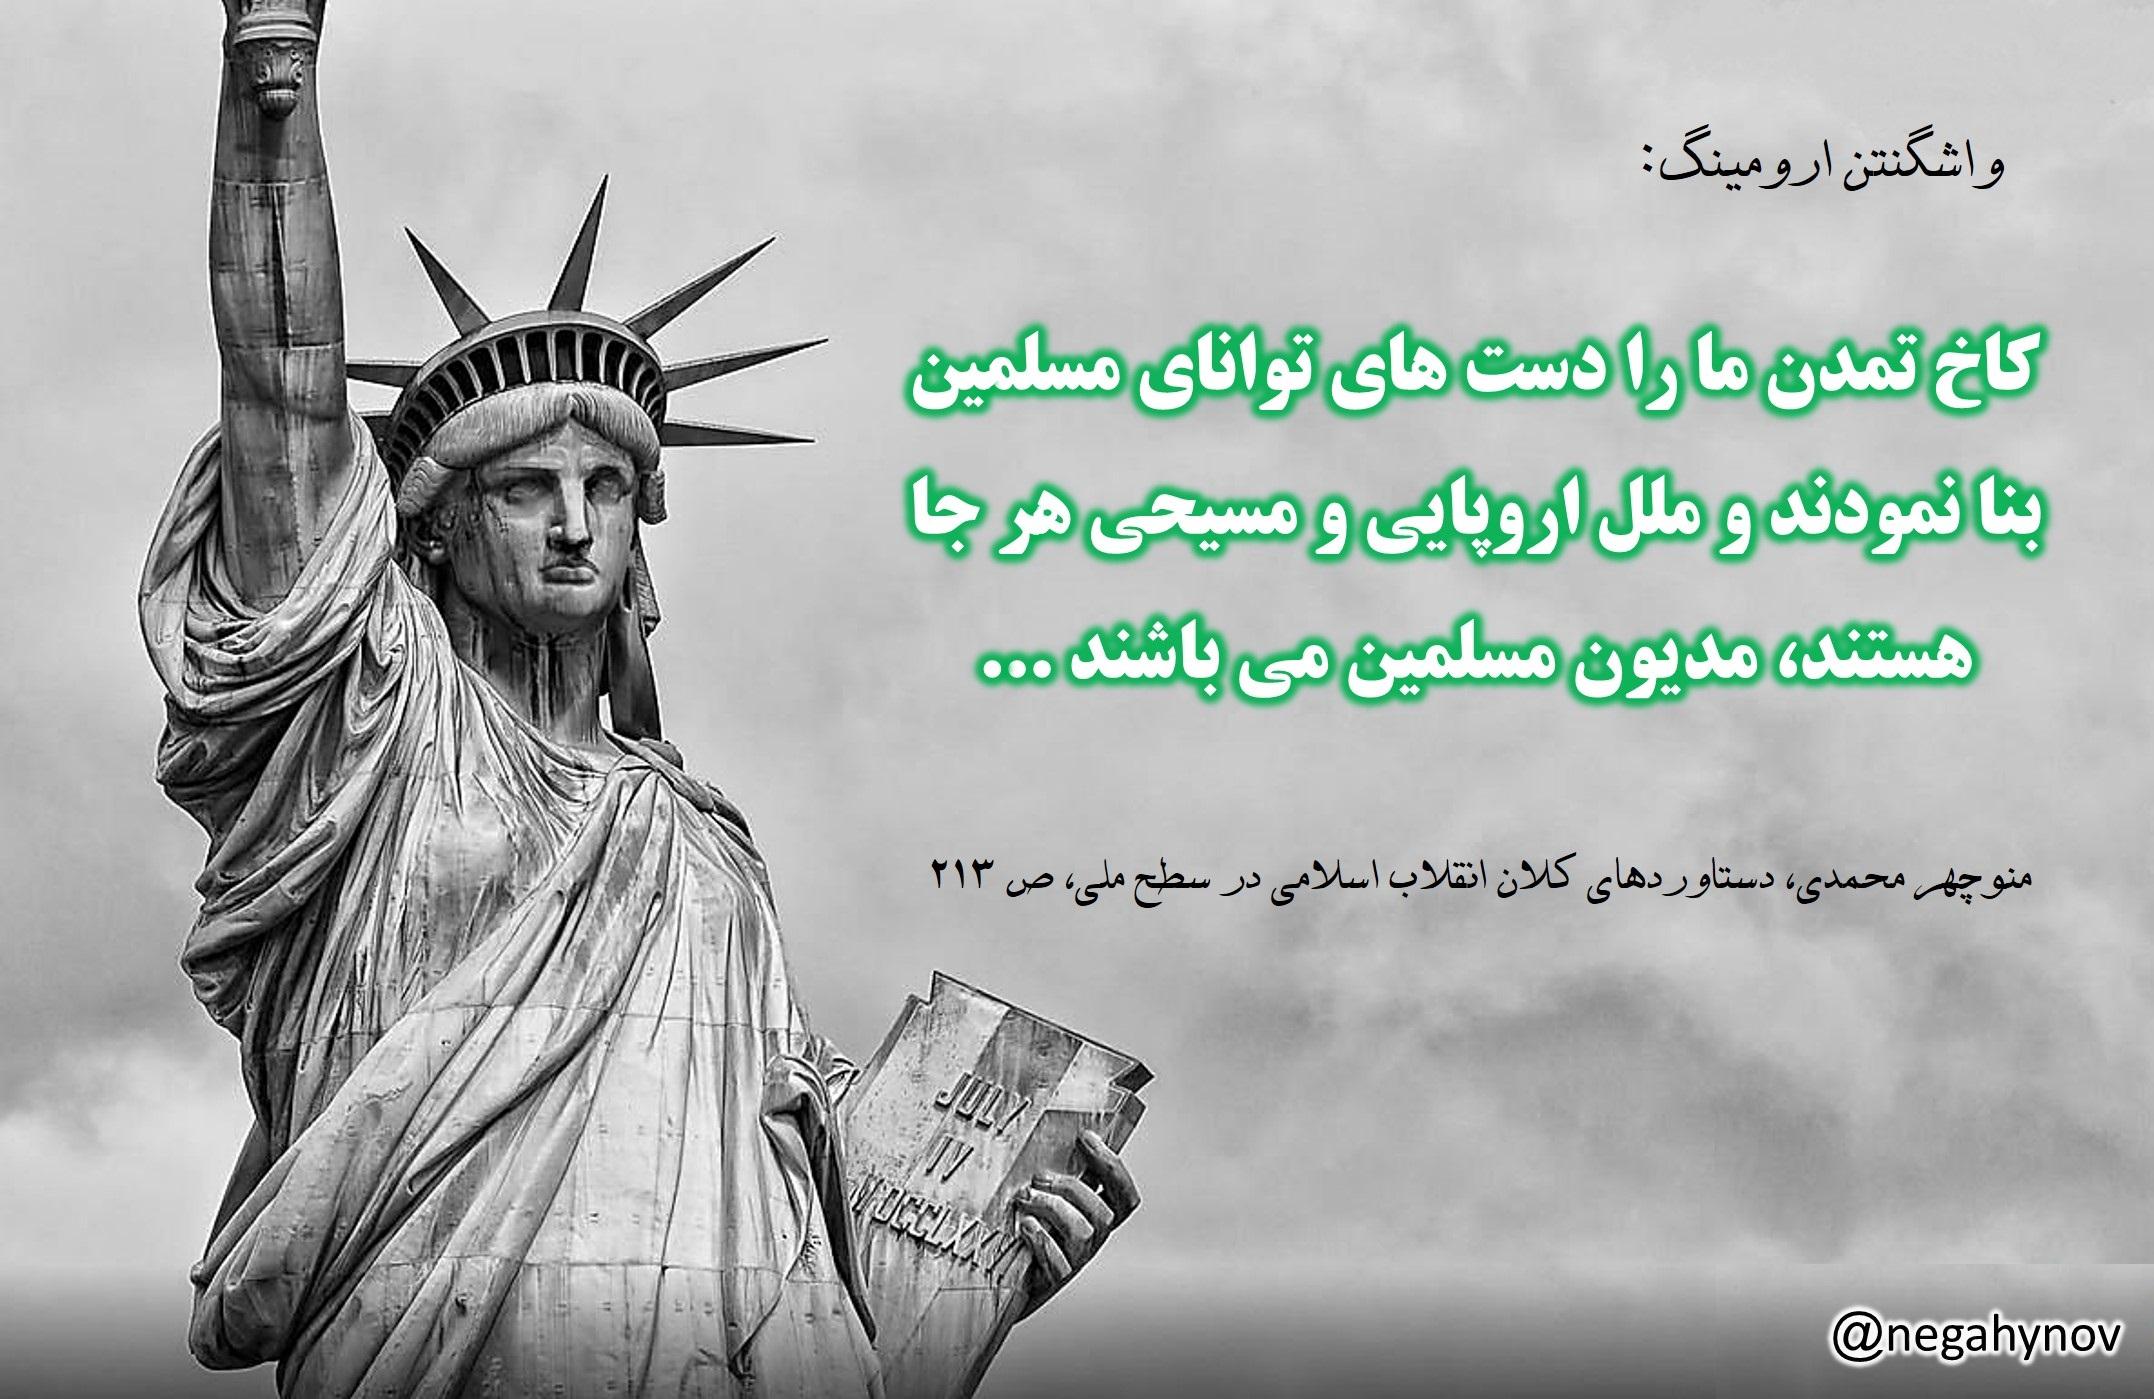 تمدن غرب مدیون مسلمانان - نگاهی نو